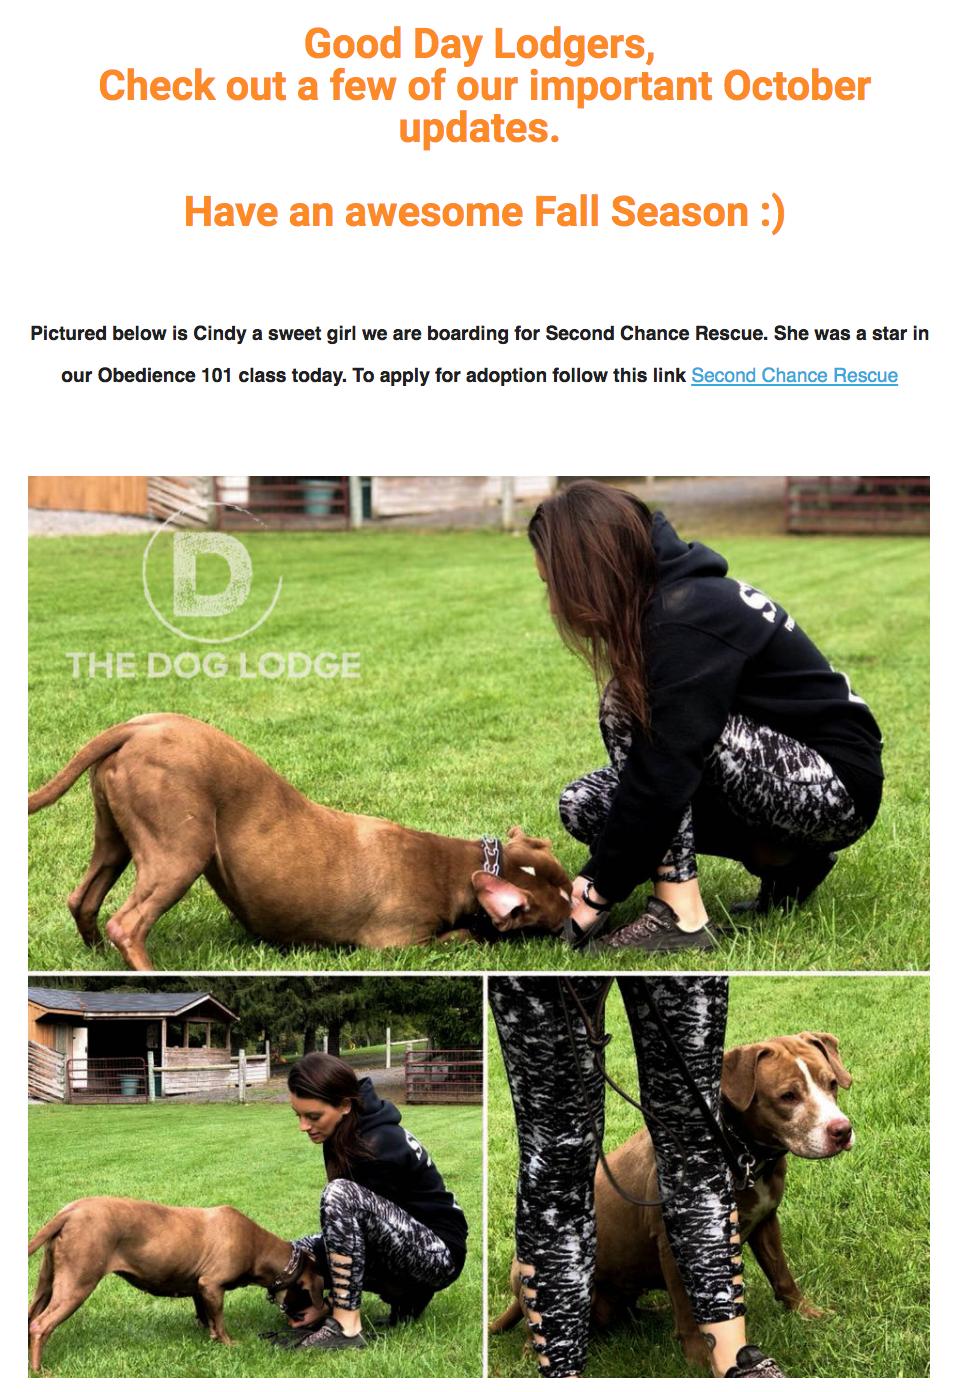 TheDogLodgeNewsletterOctober17.png